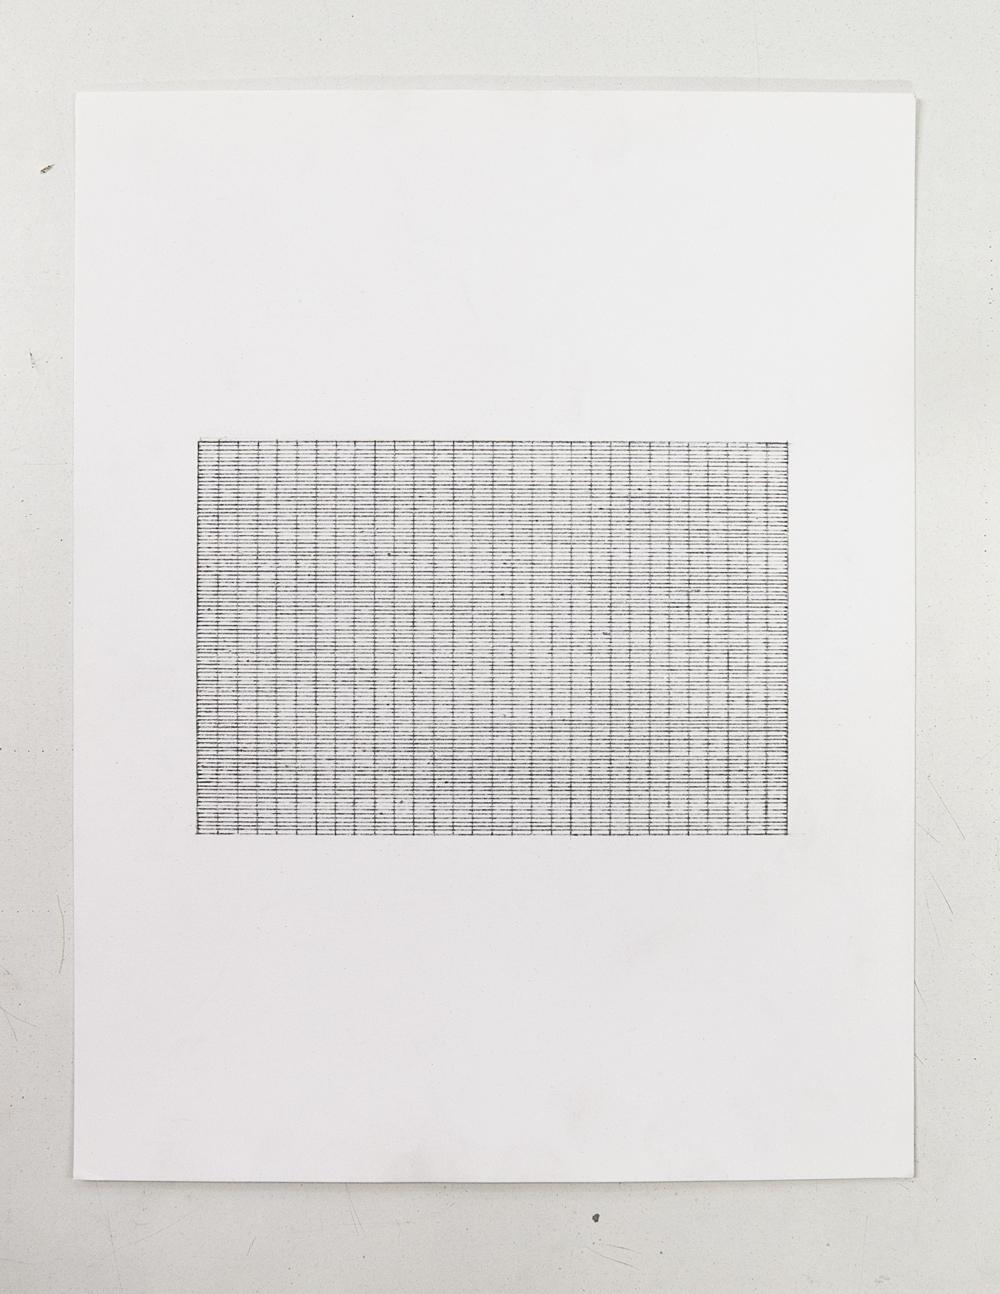 (PRISONTIME/PRISONINME: Transition to Metric) 1  5mm x 1mm on 5cm x 10cm,2014   Pencil on semi-matte inkjet fiber paper, 8.5 in.x 11 in.